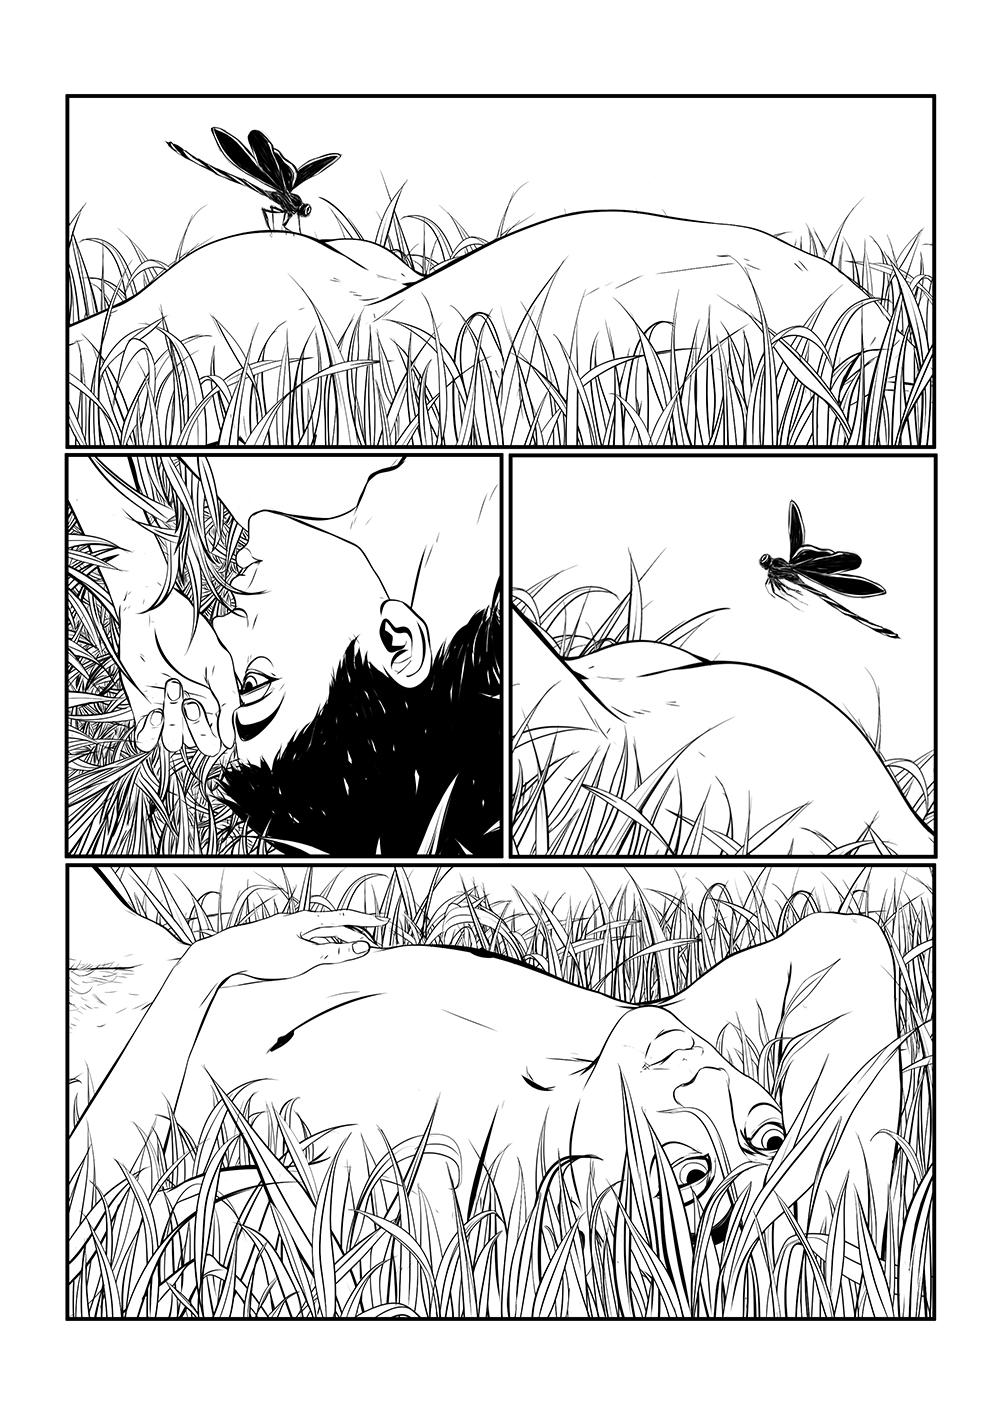 mojowang_illustration_betweenrivers_24_1.jpg